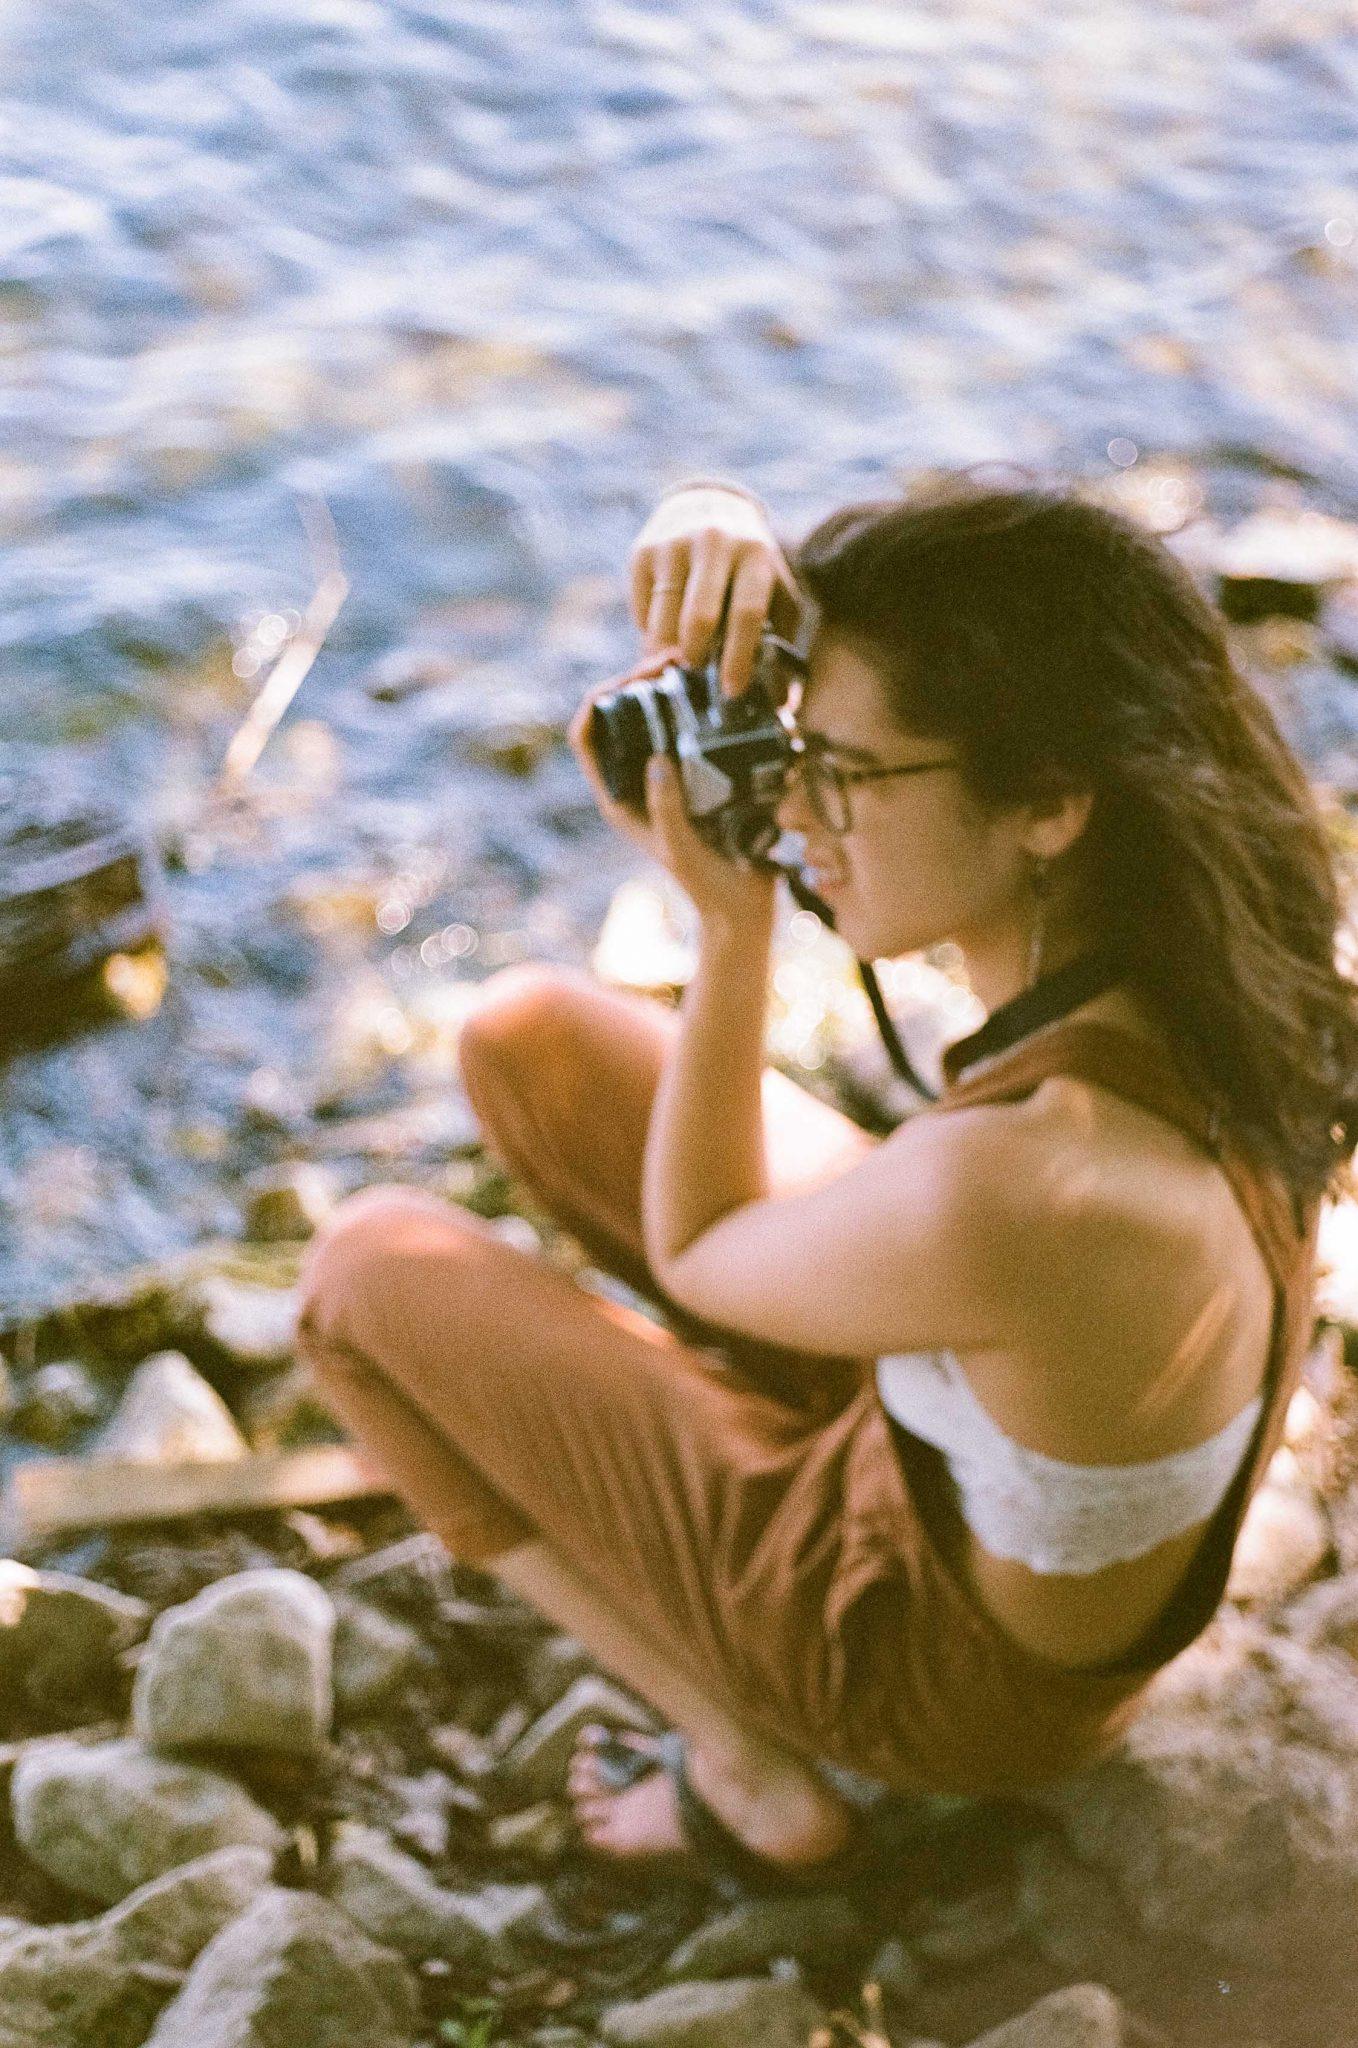 Nikon FE + 50mm F/2 + Fujifilm Superia 400